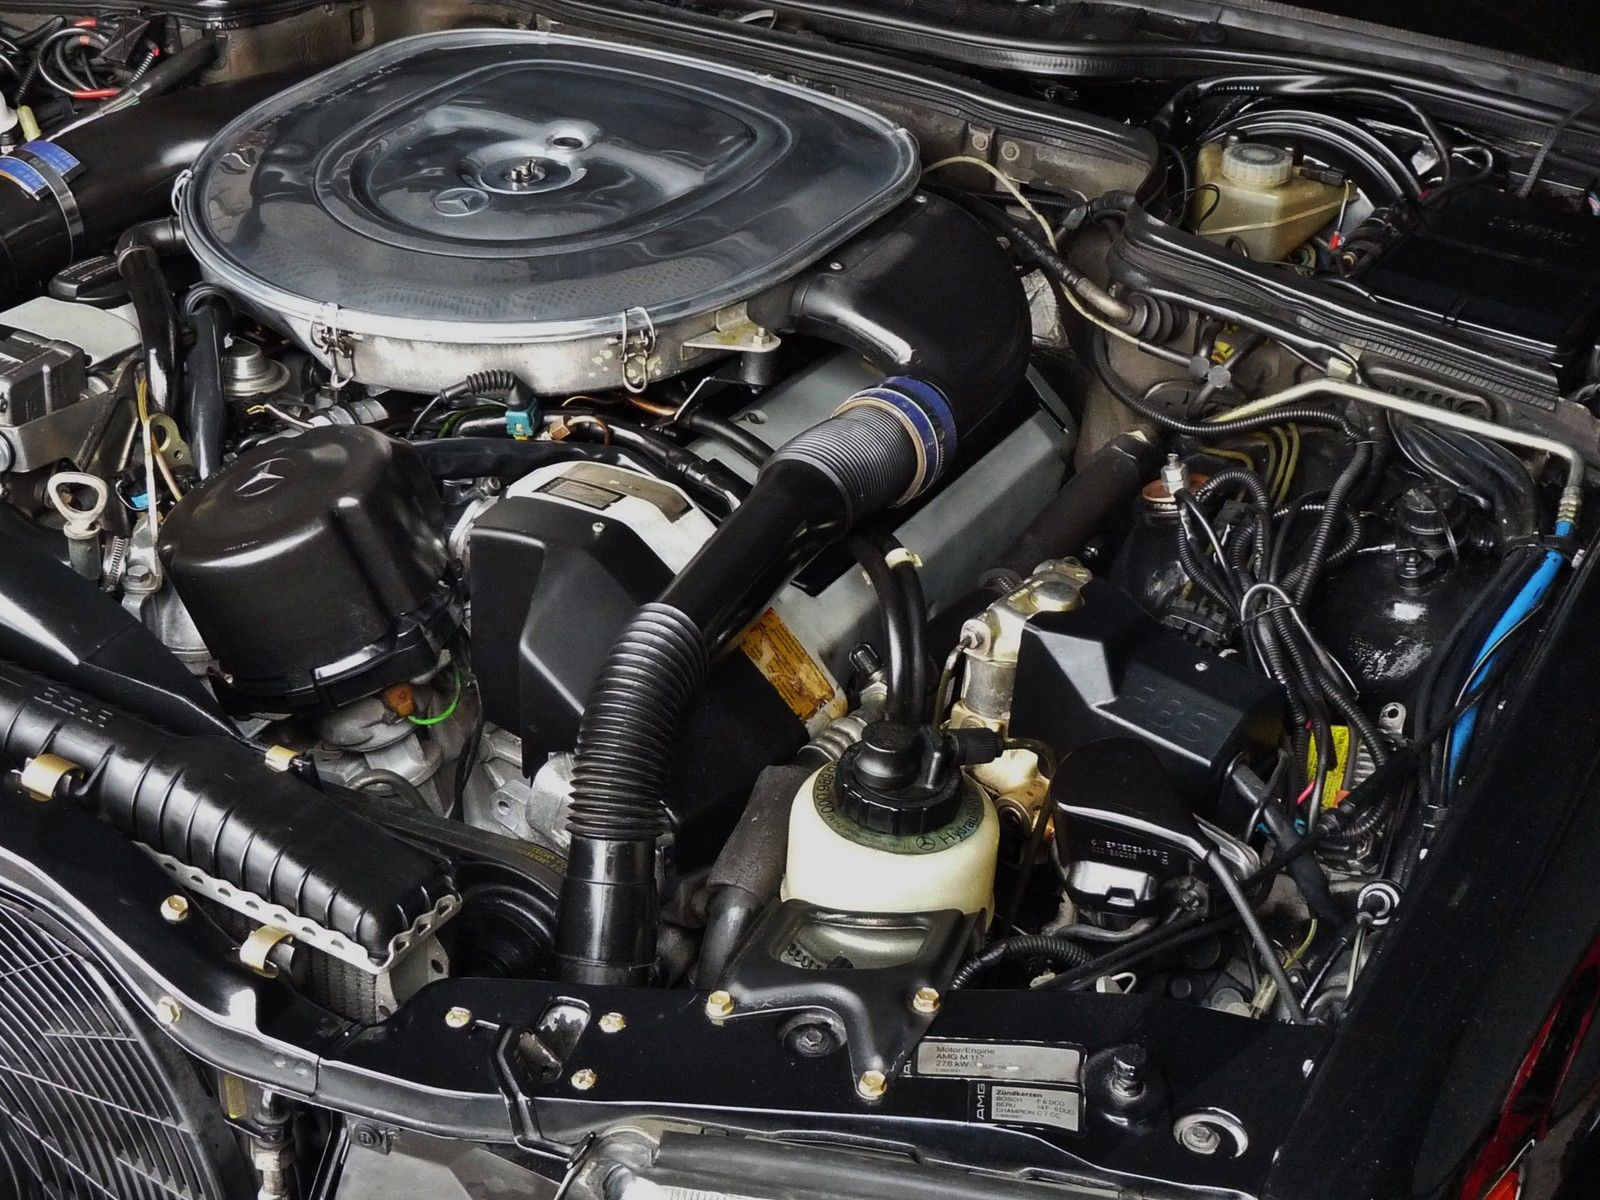 1990 Mercedes Benz 560sec Amg 6 0 Widebody Is Badass But